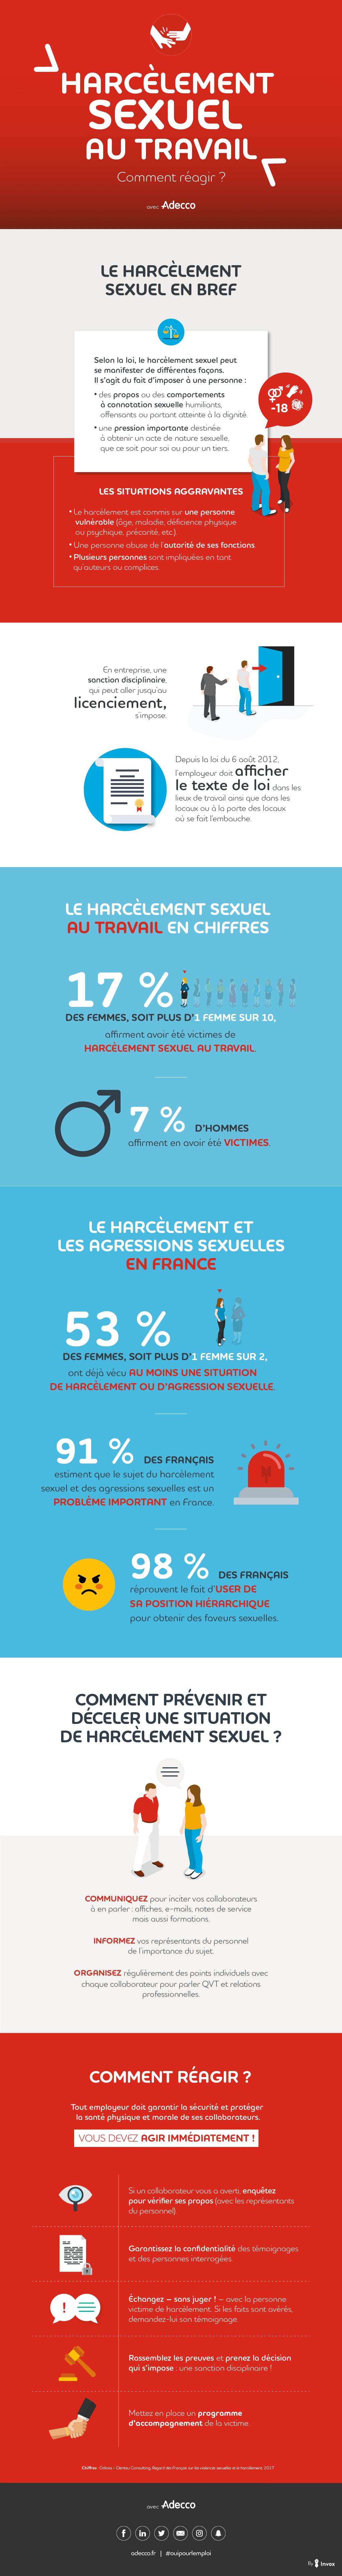 infographie harcèlement